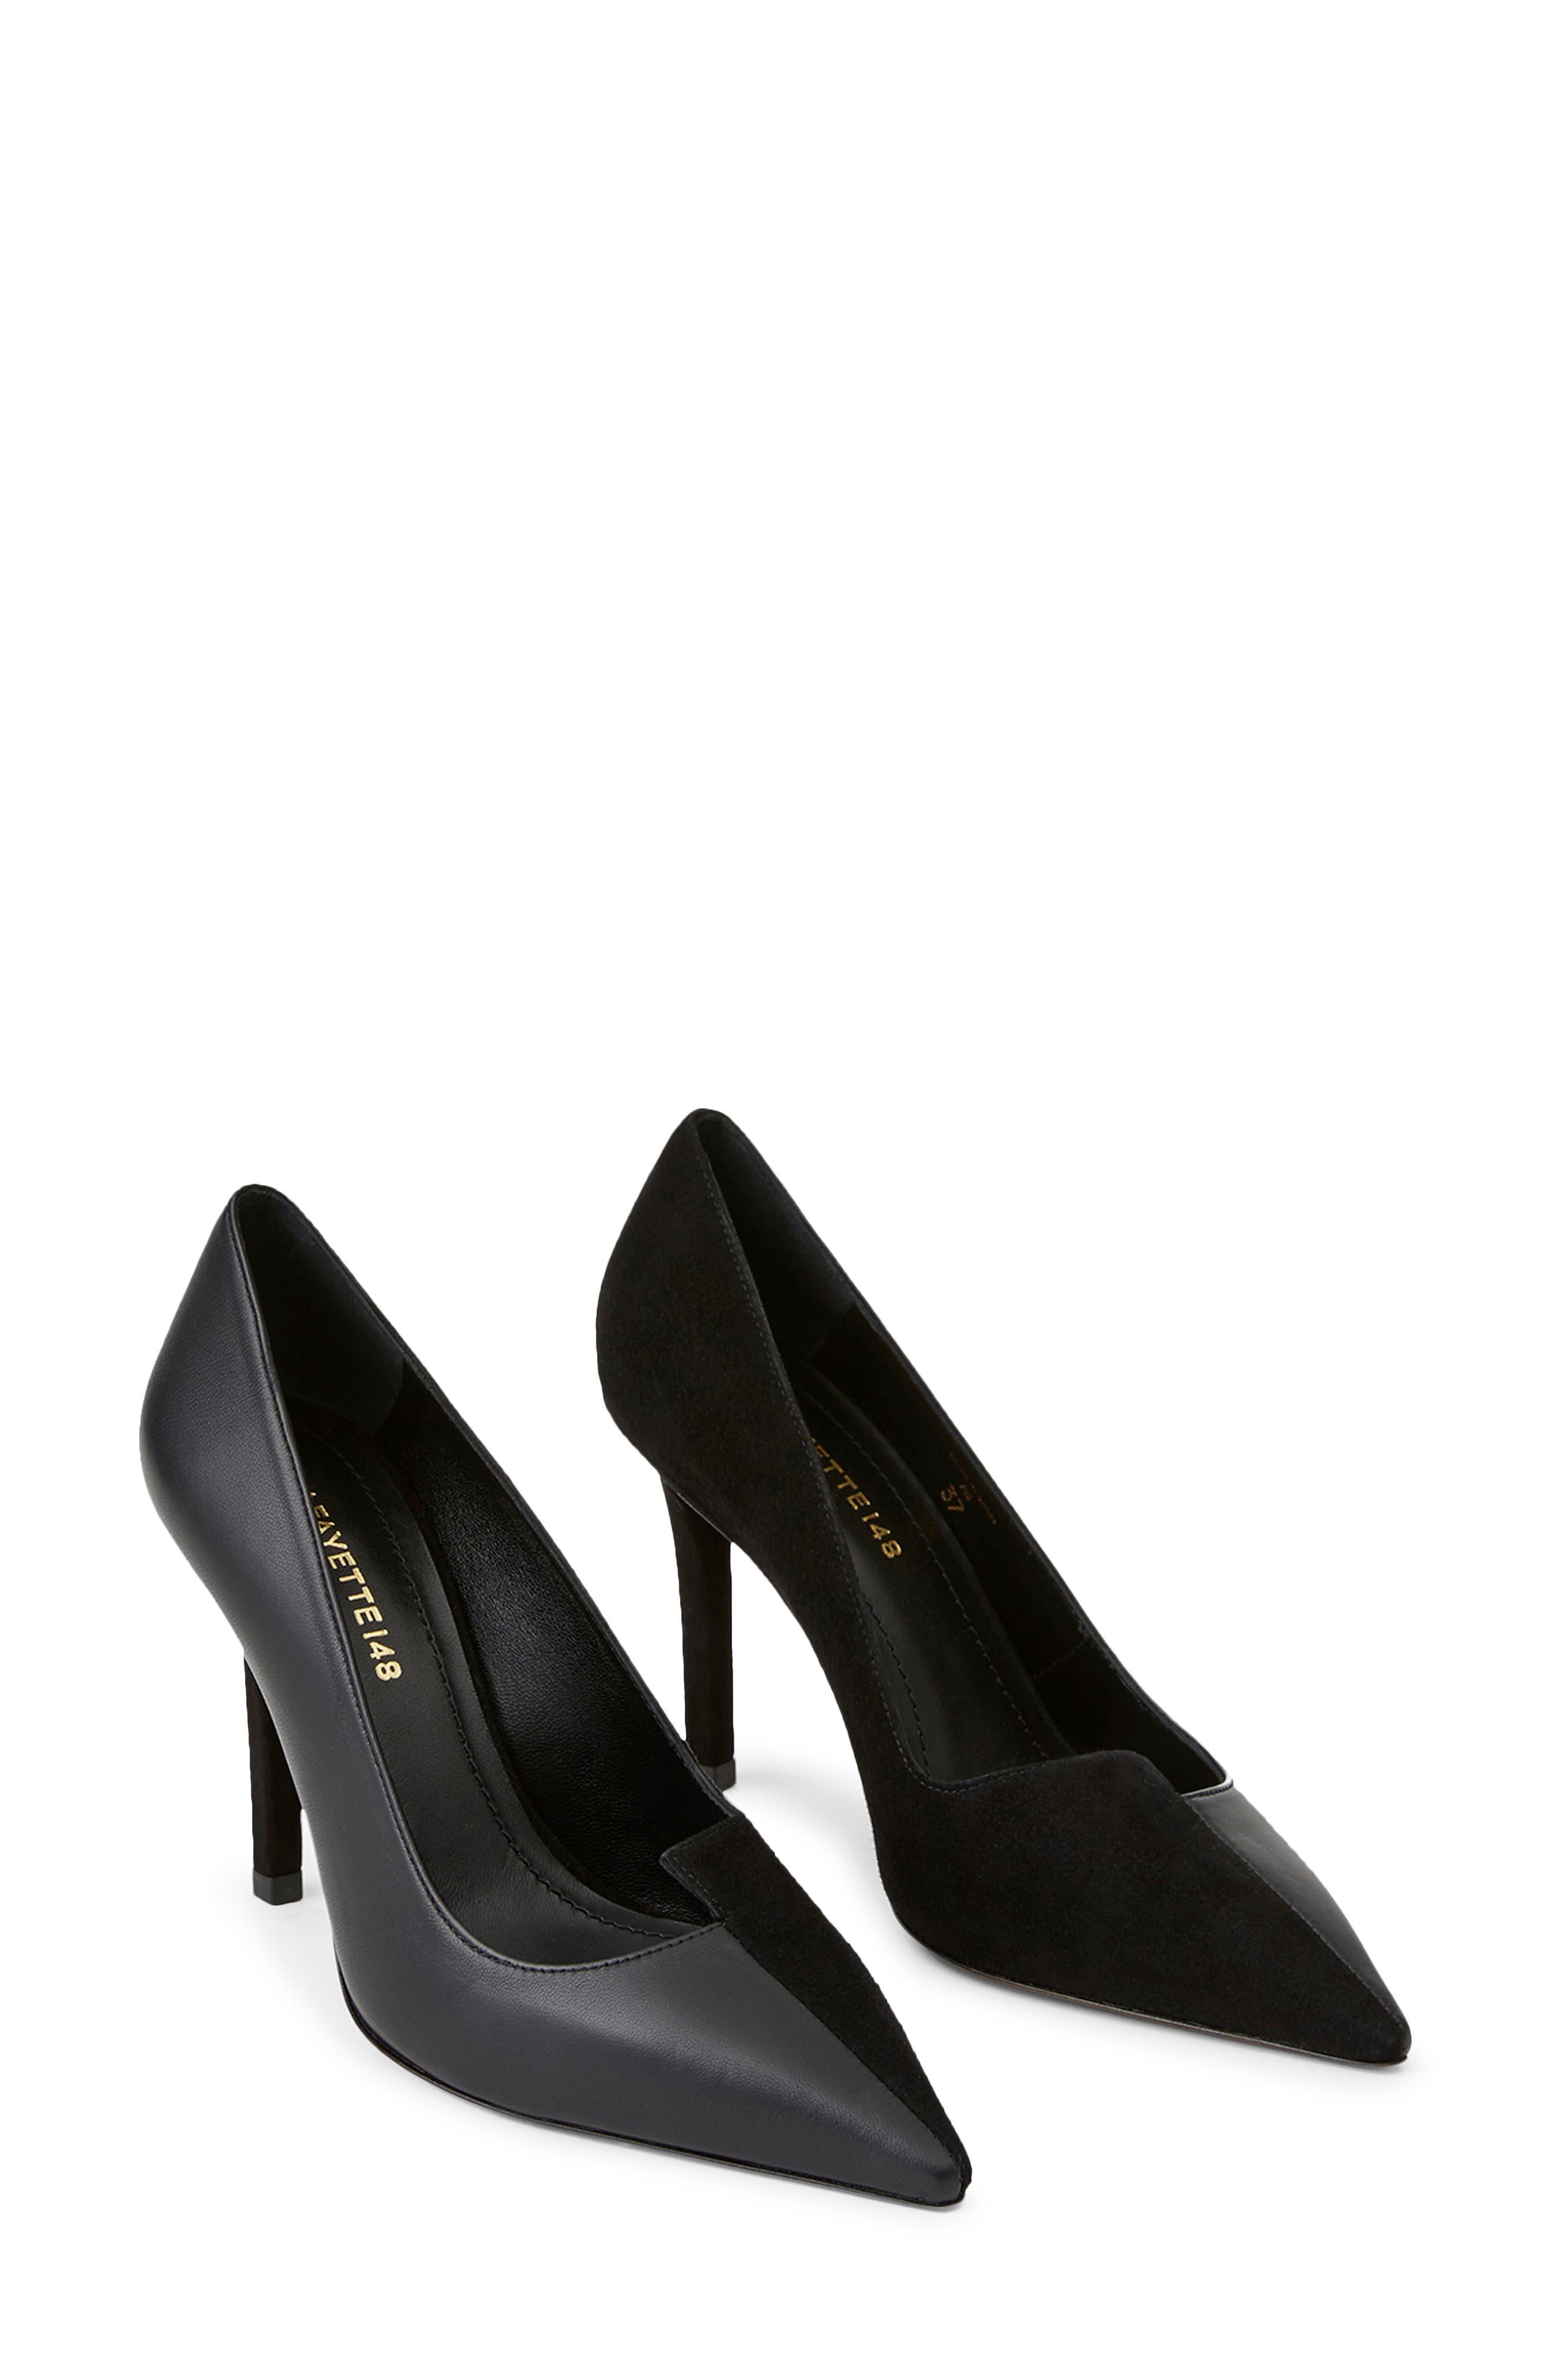 Women's $300 – $500 Designer Shoes